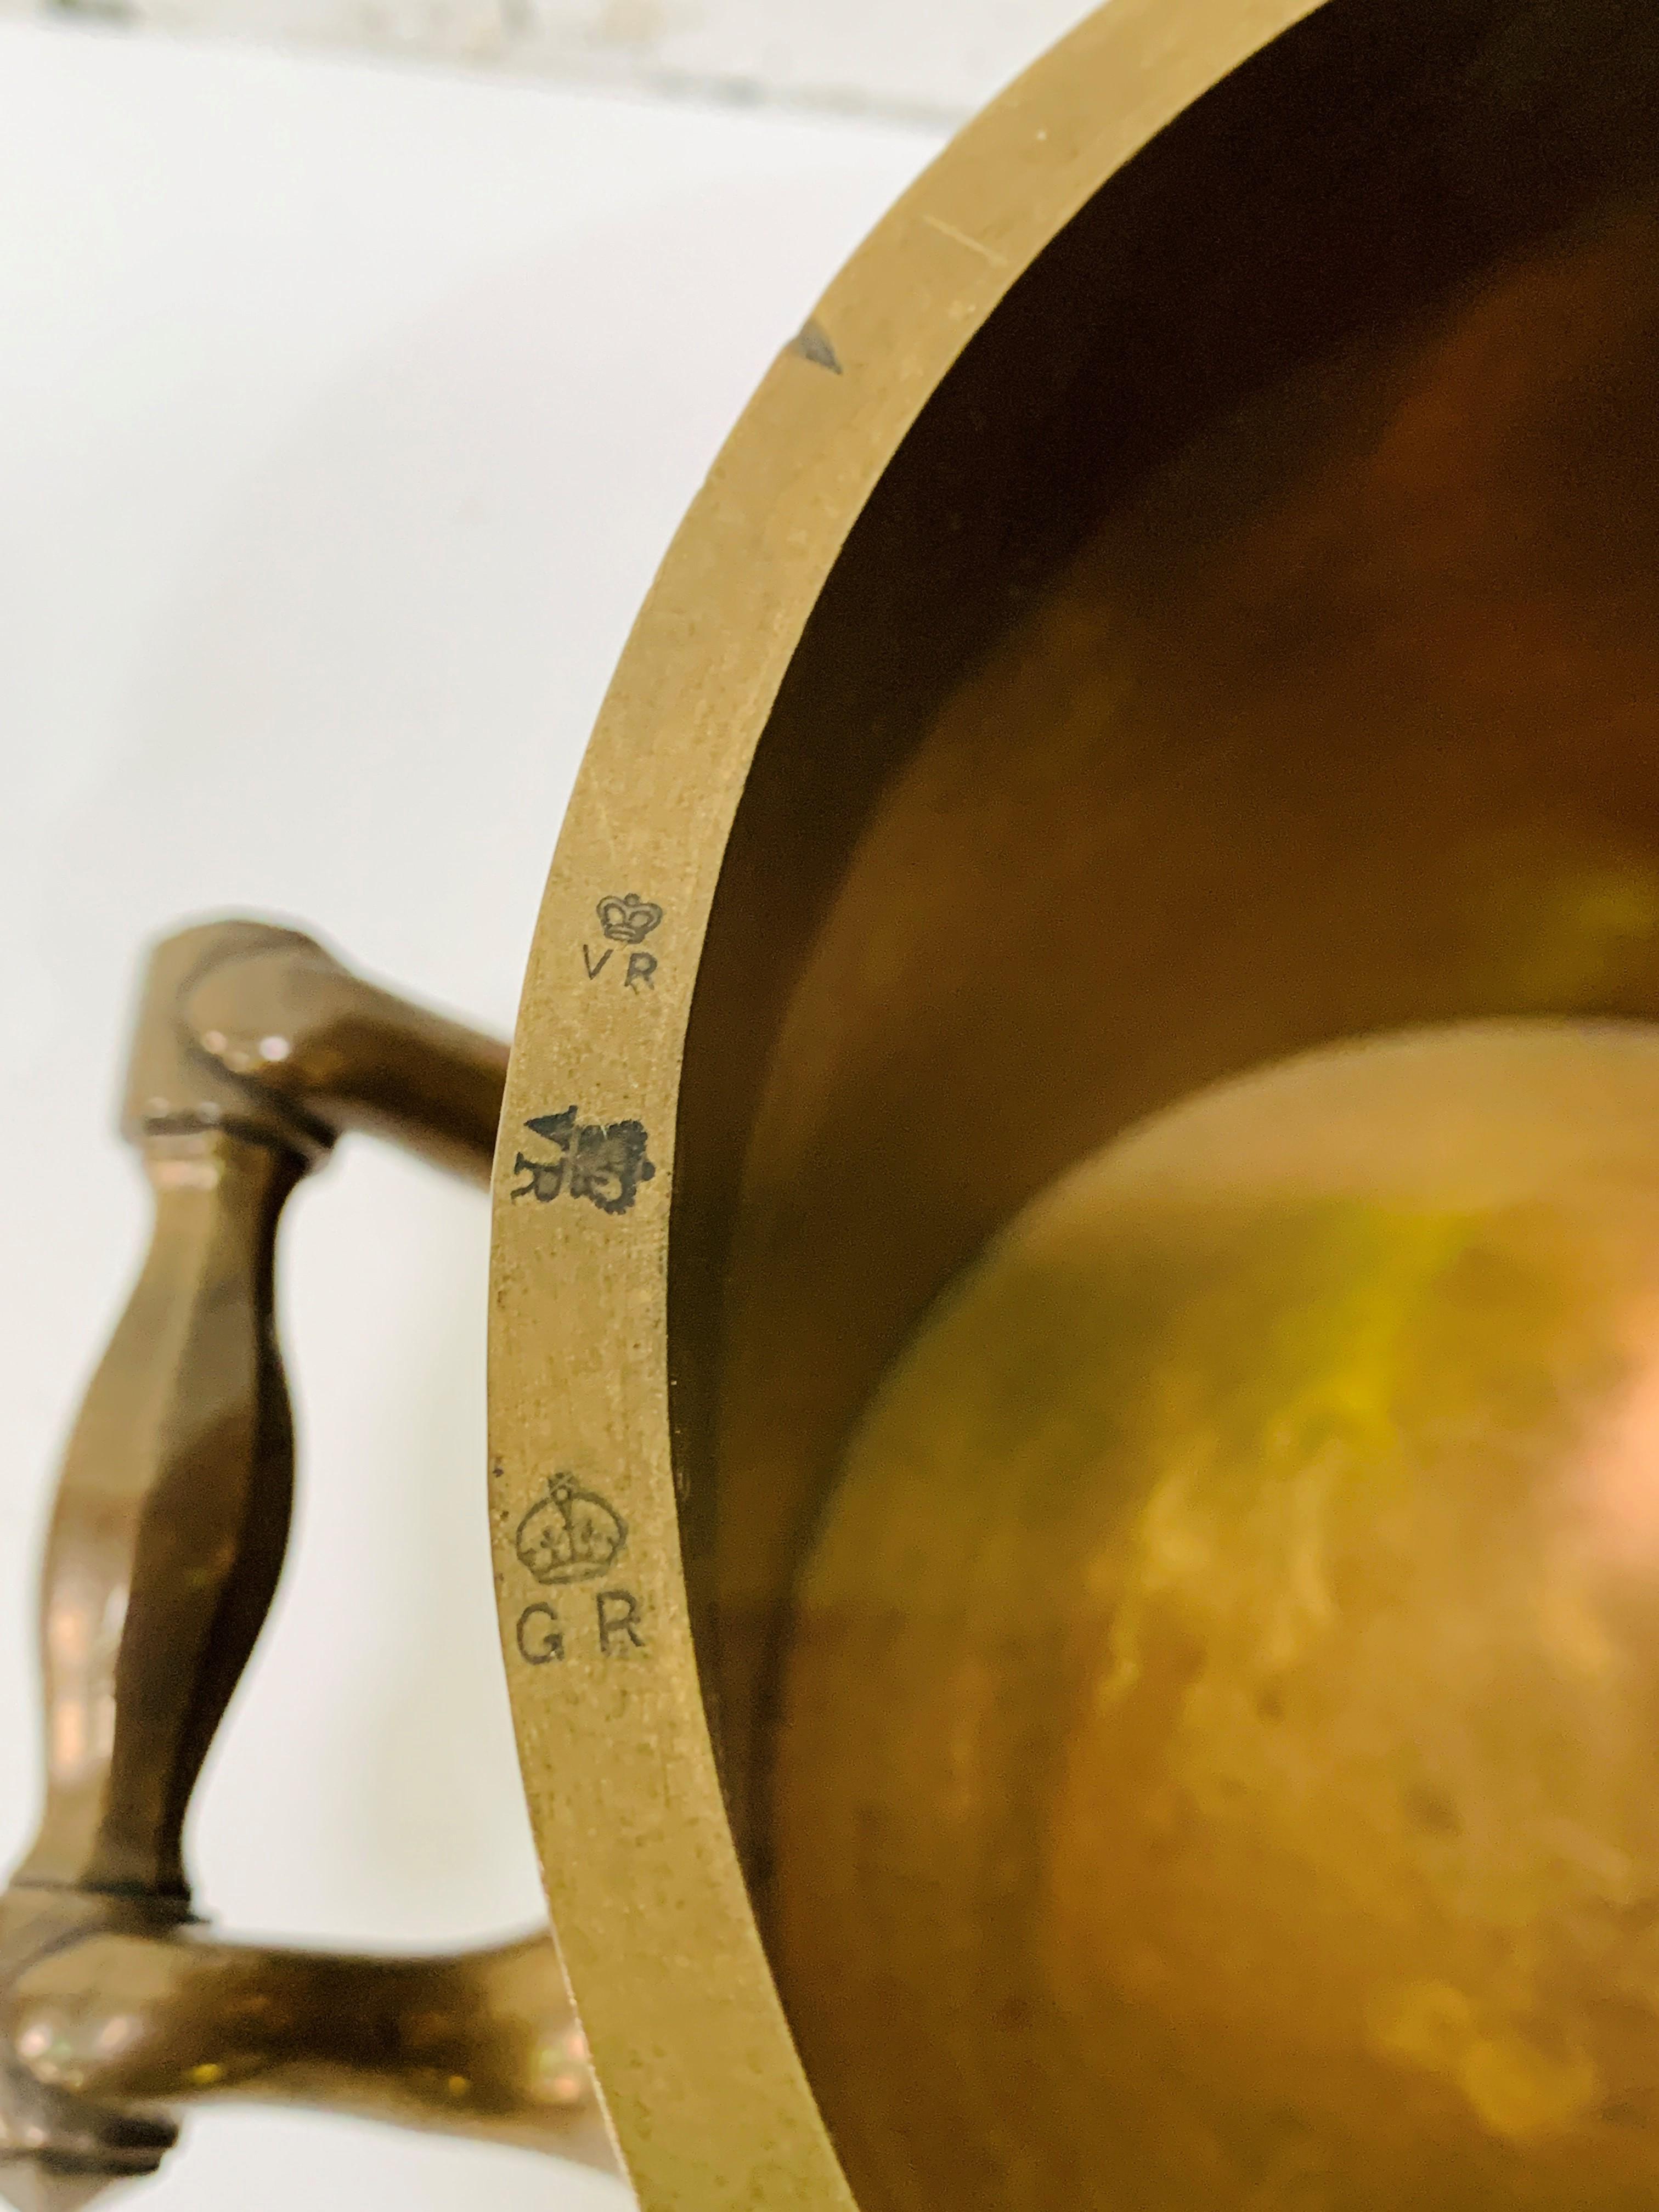 Imperial gallon bronze measure - Image 3 of 4